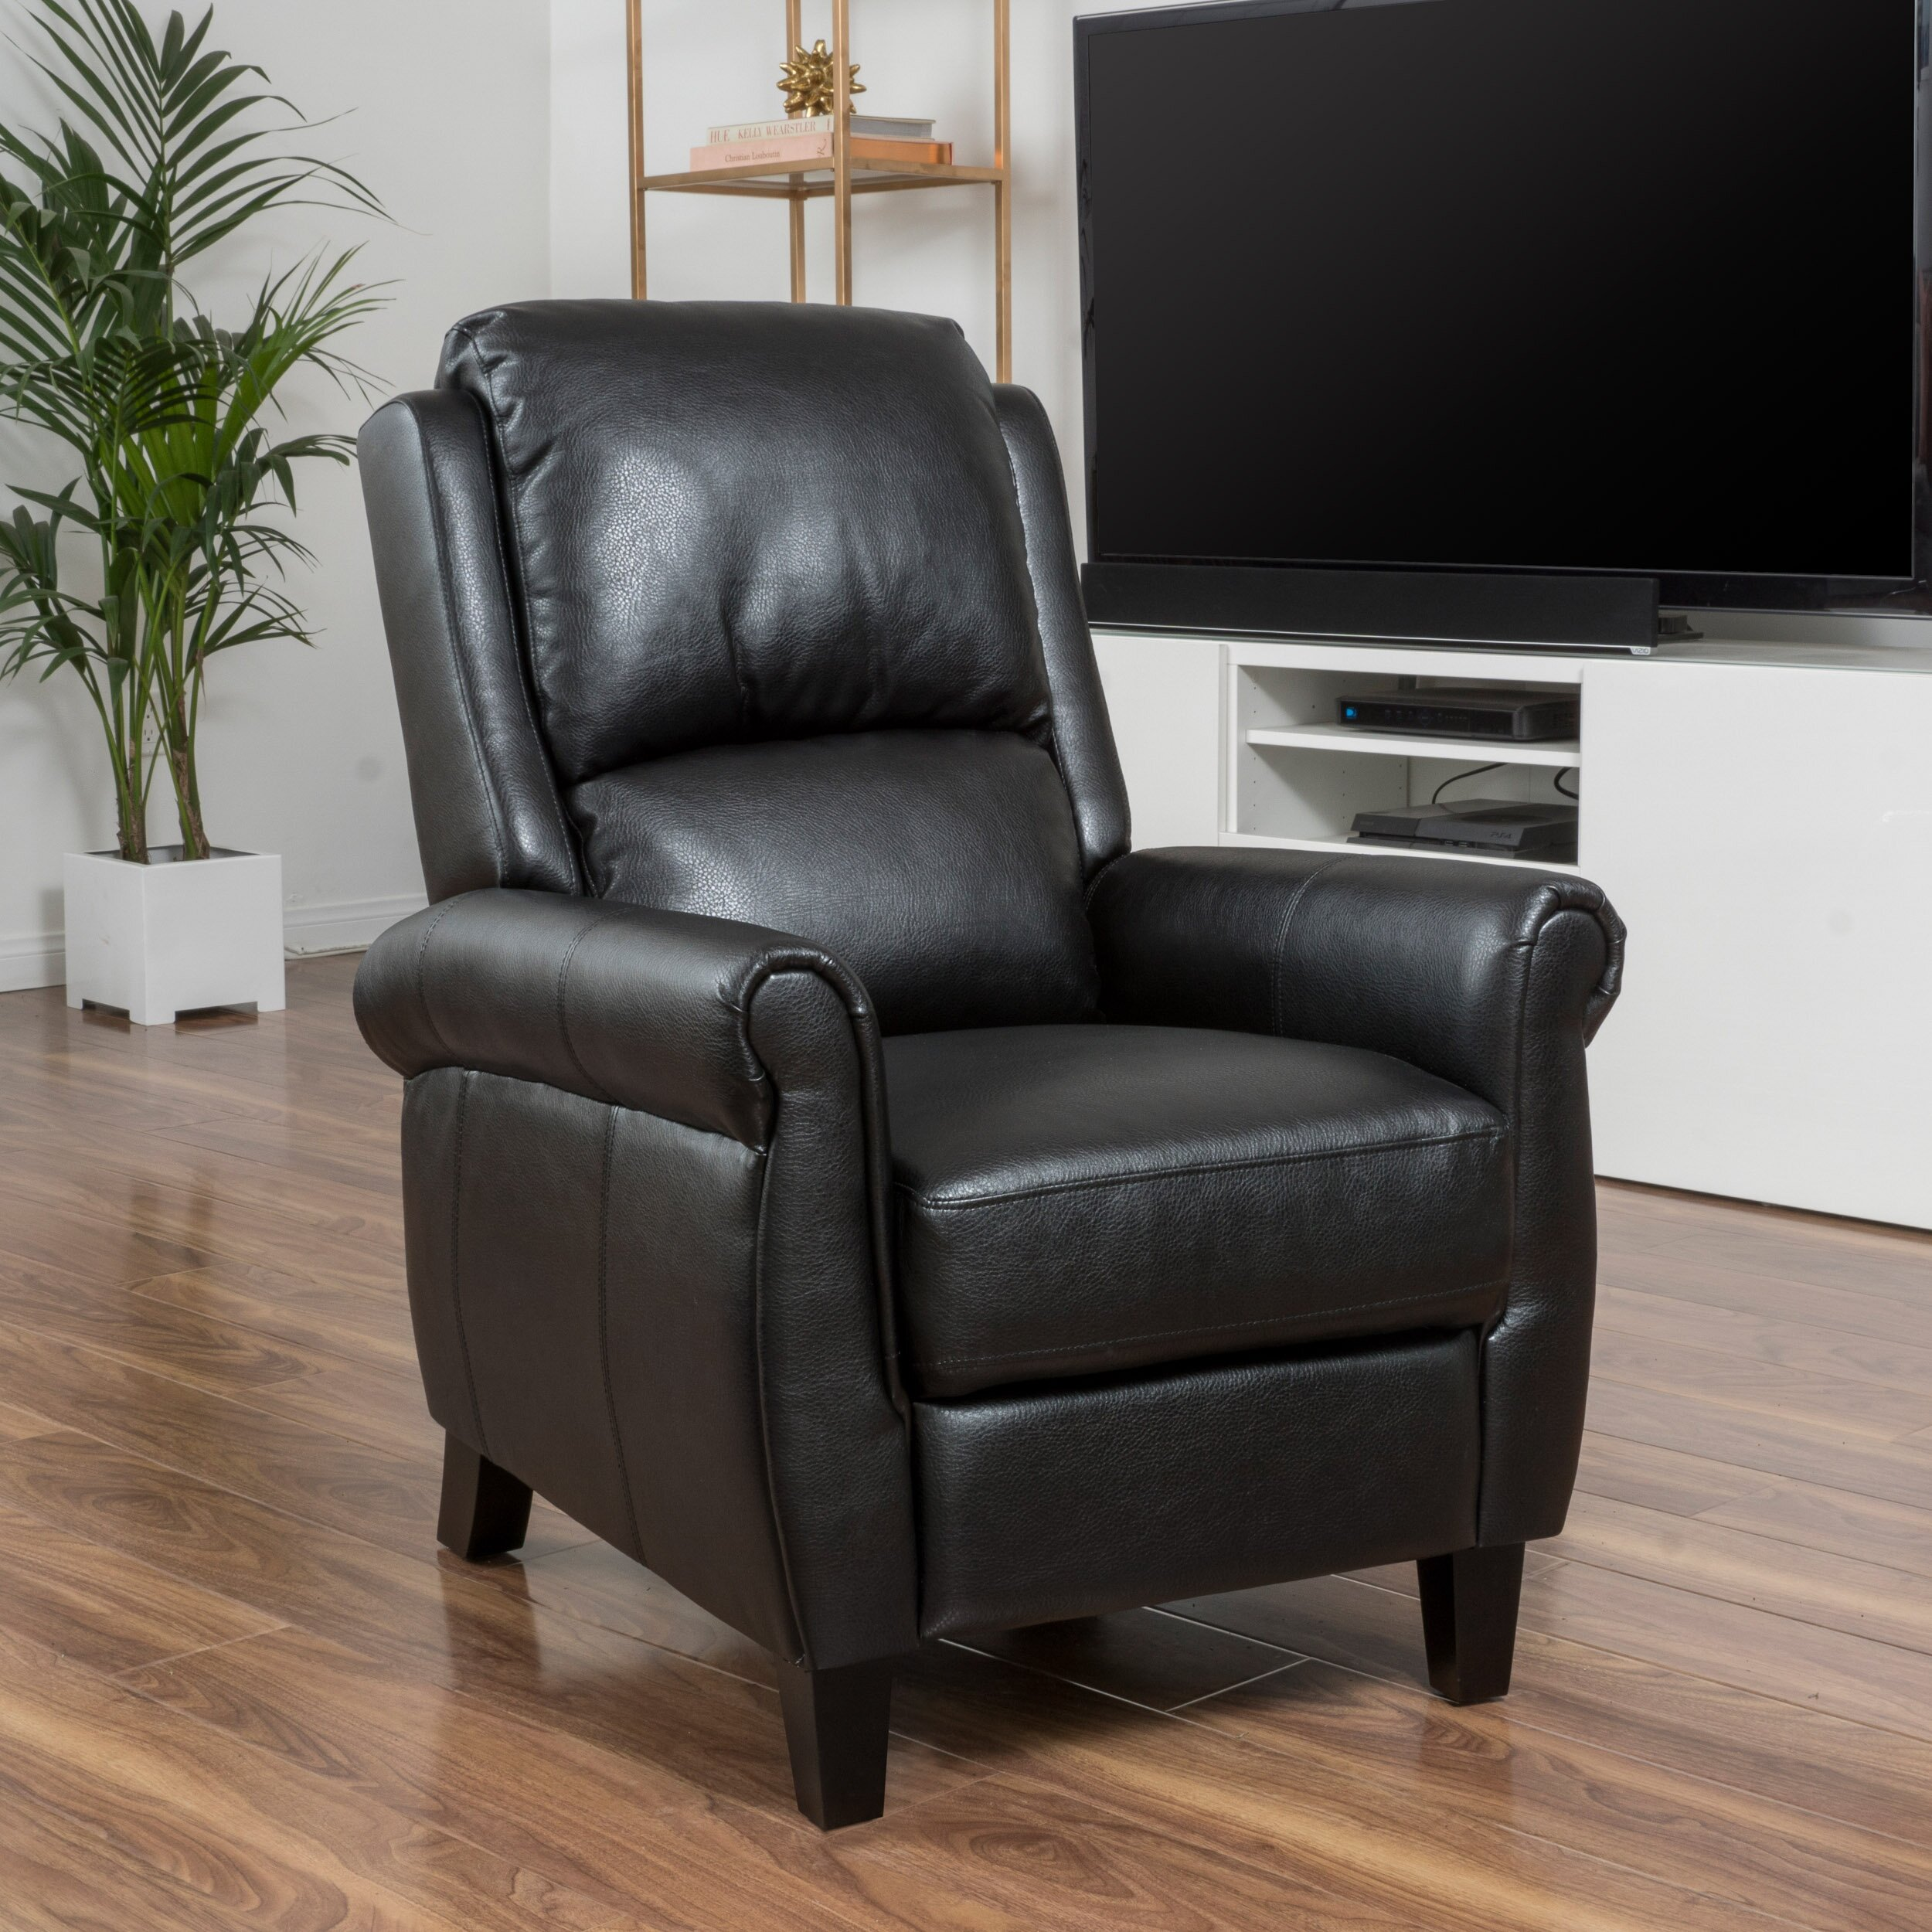 deerfiled pu leather recliner club chair reviews wayfair supply